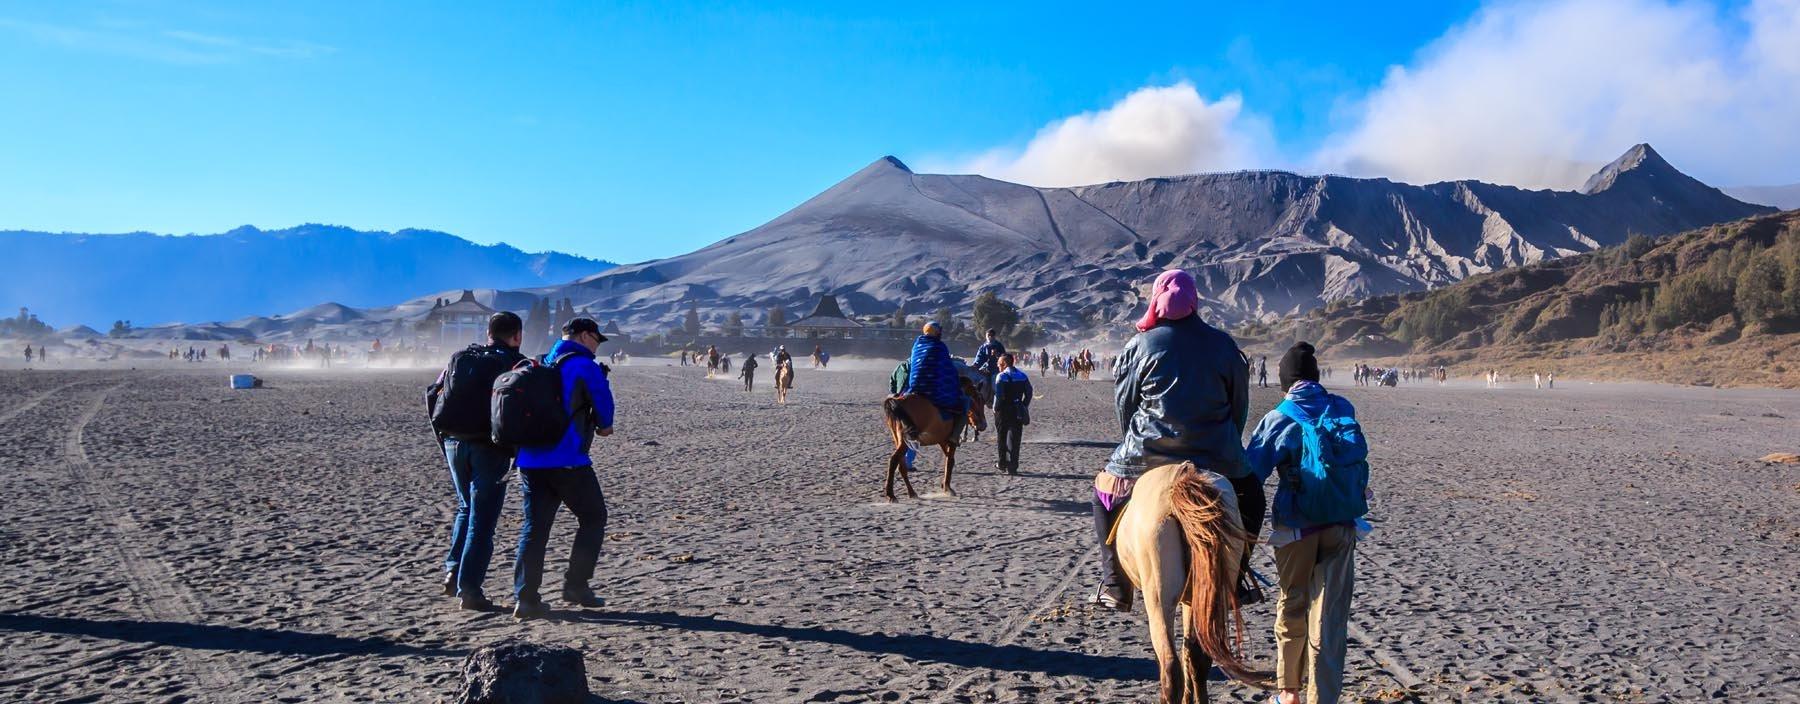 id, java, mount bromo volcano.jpg